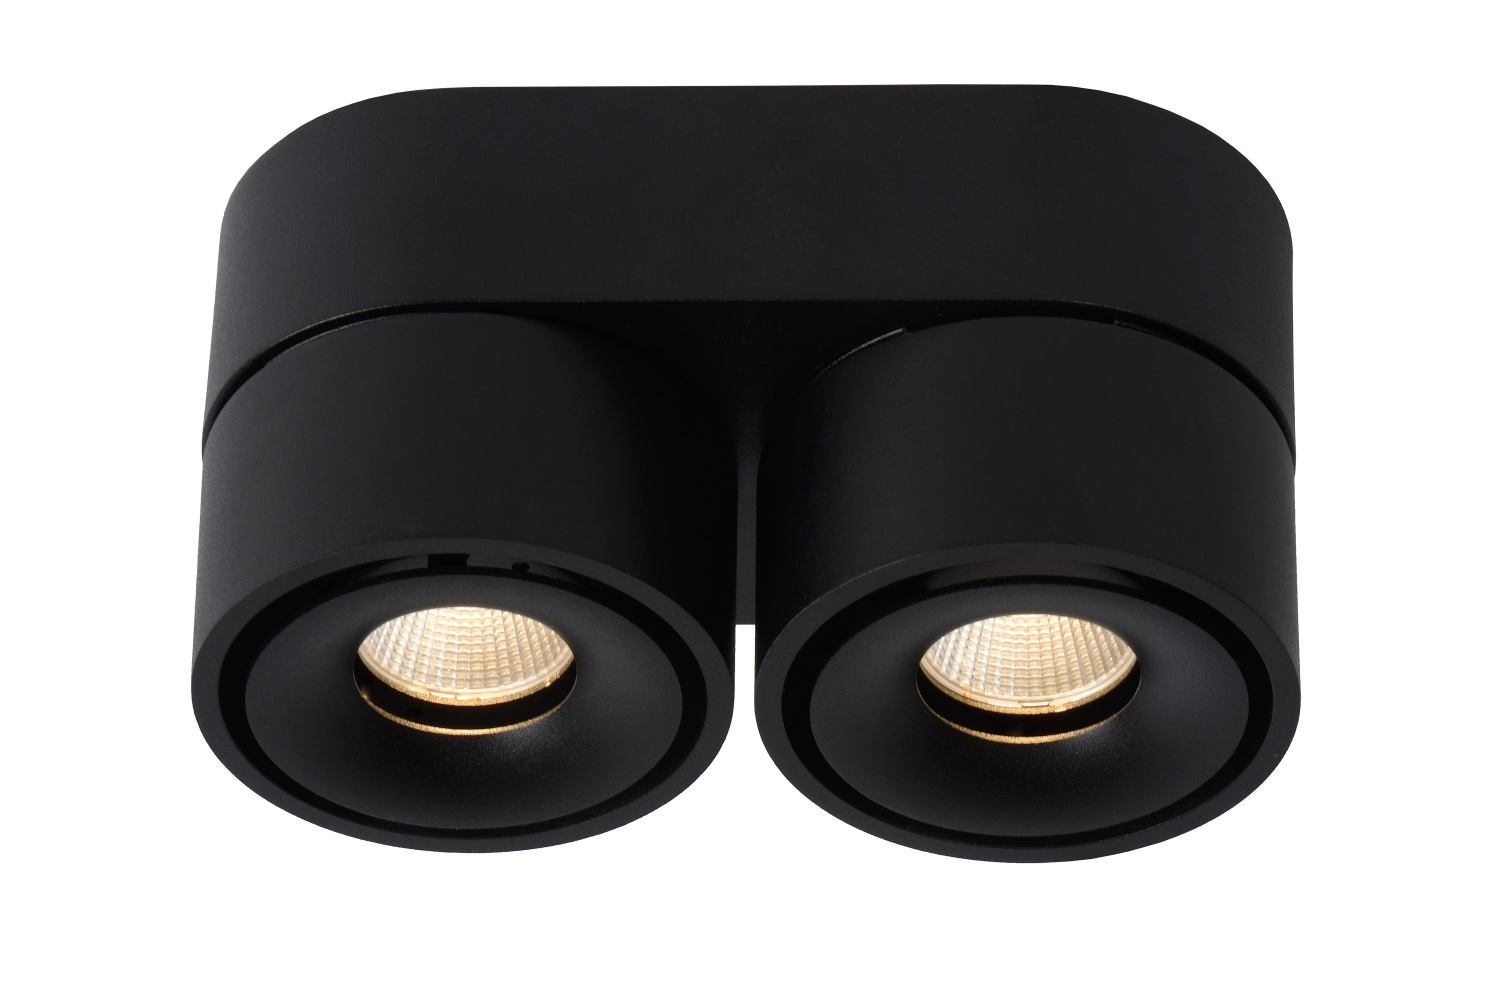 Lucide YUMIKO Plafondspot-Zwart-Ø7,8-LED Dimb.-10W-2700K